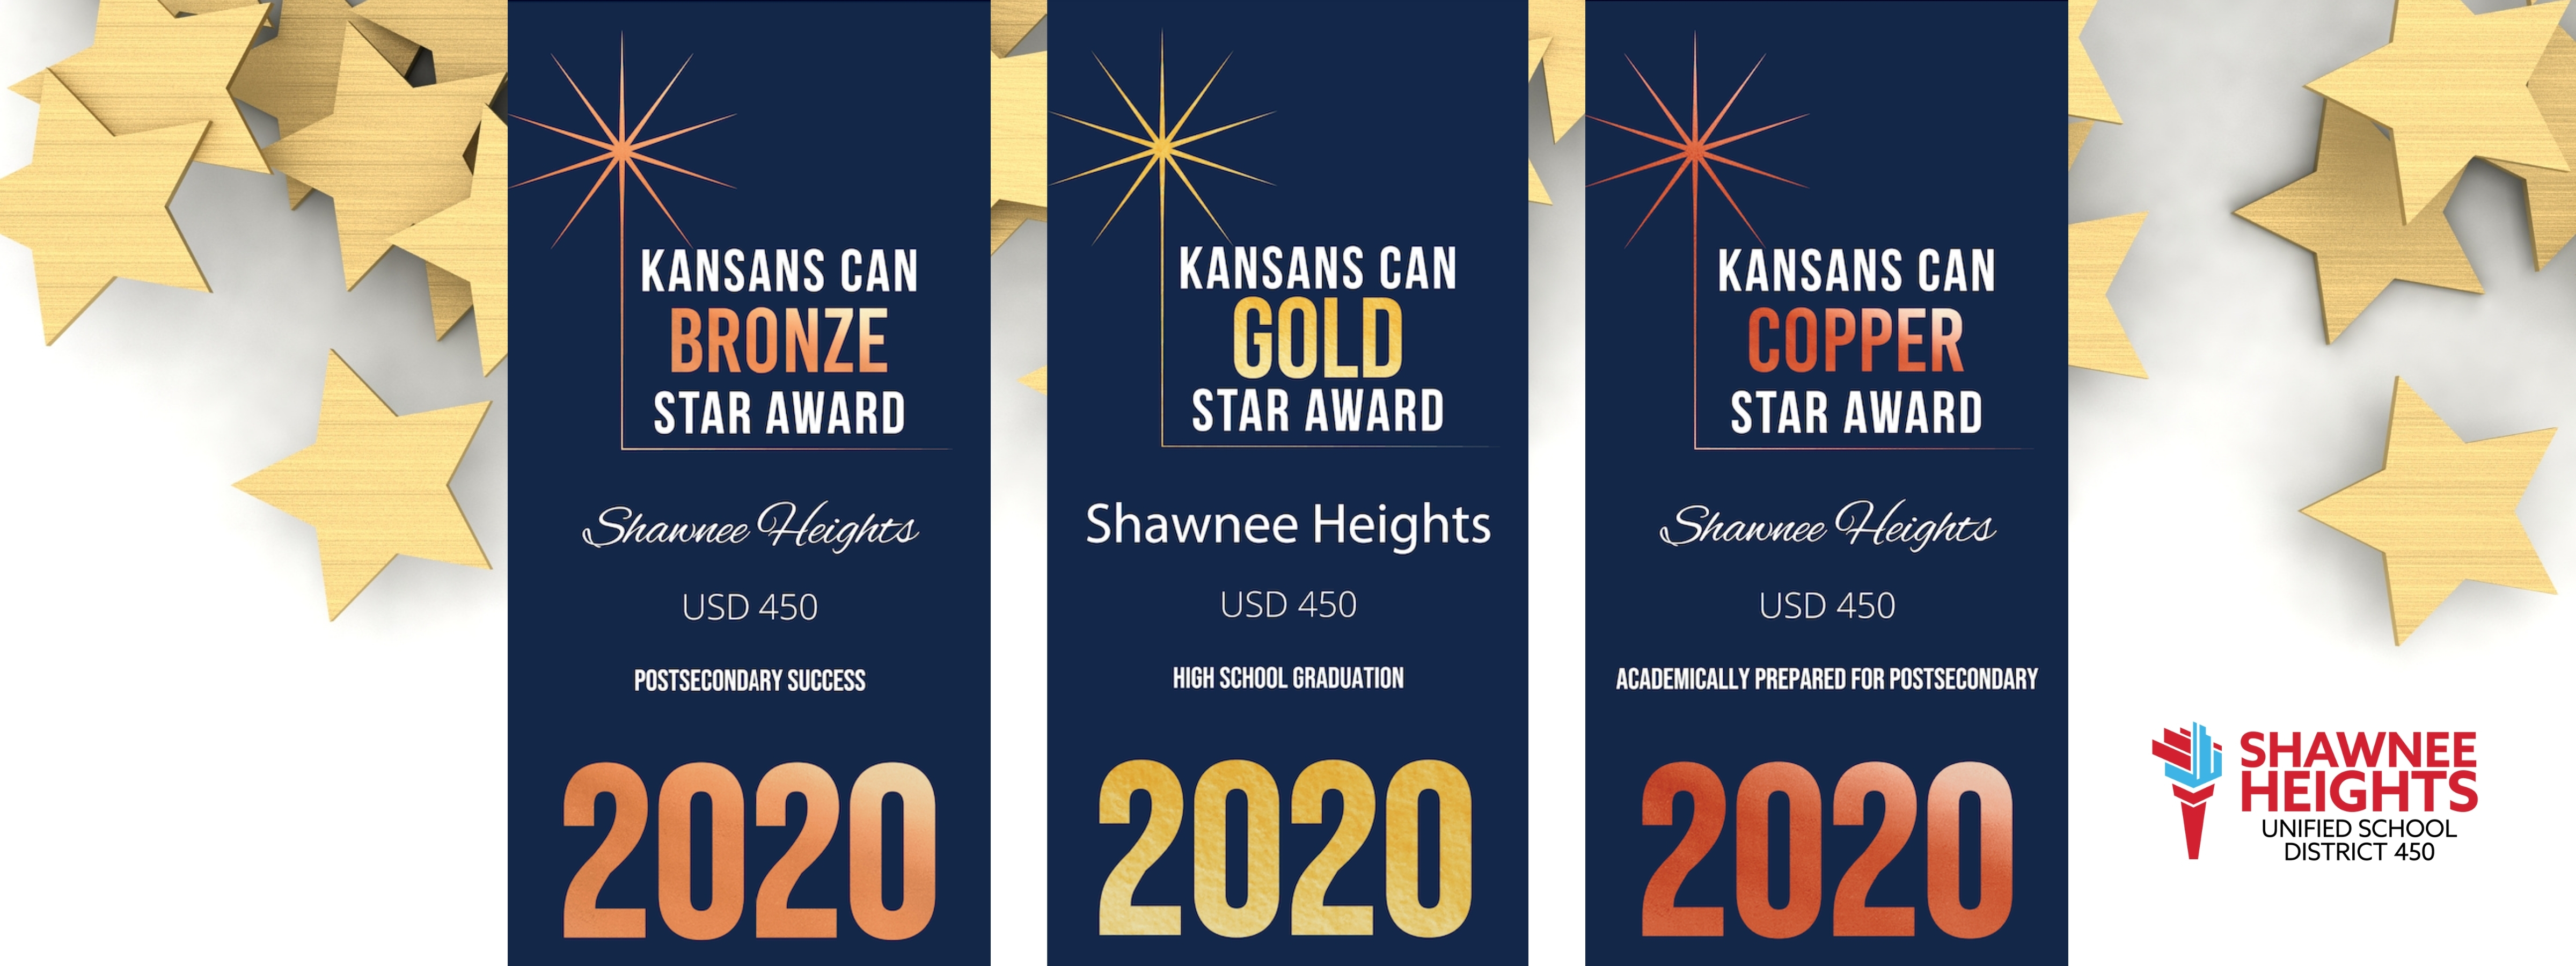 Kansans Can Star Recognition